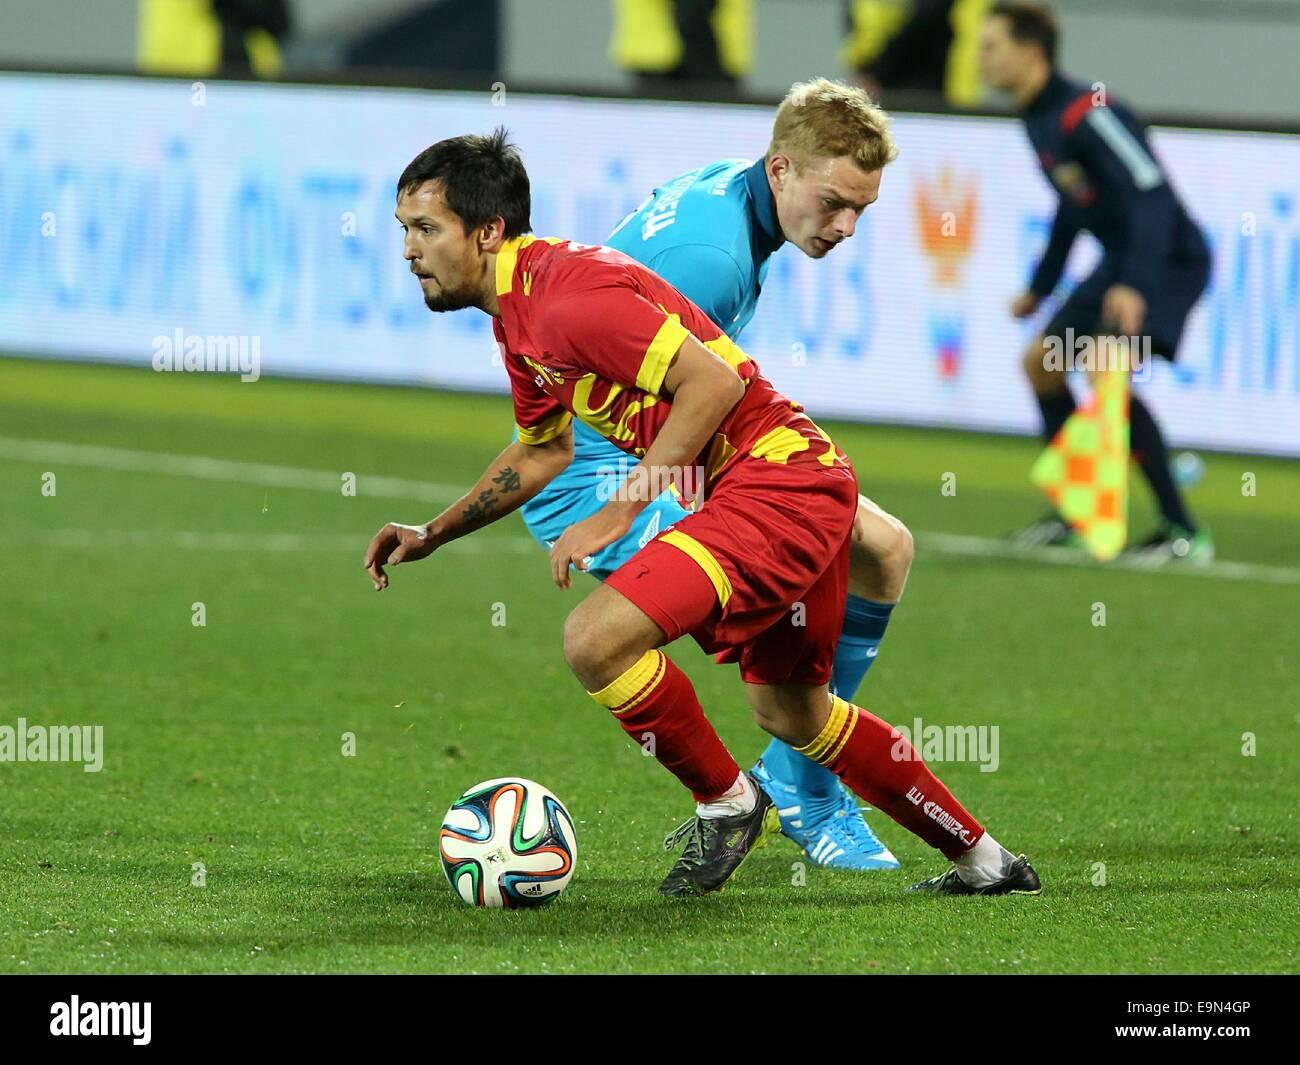 Russian footballer Arthur Maloyan: biography and sports career